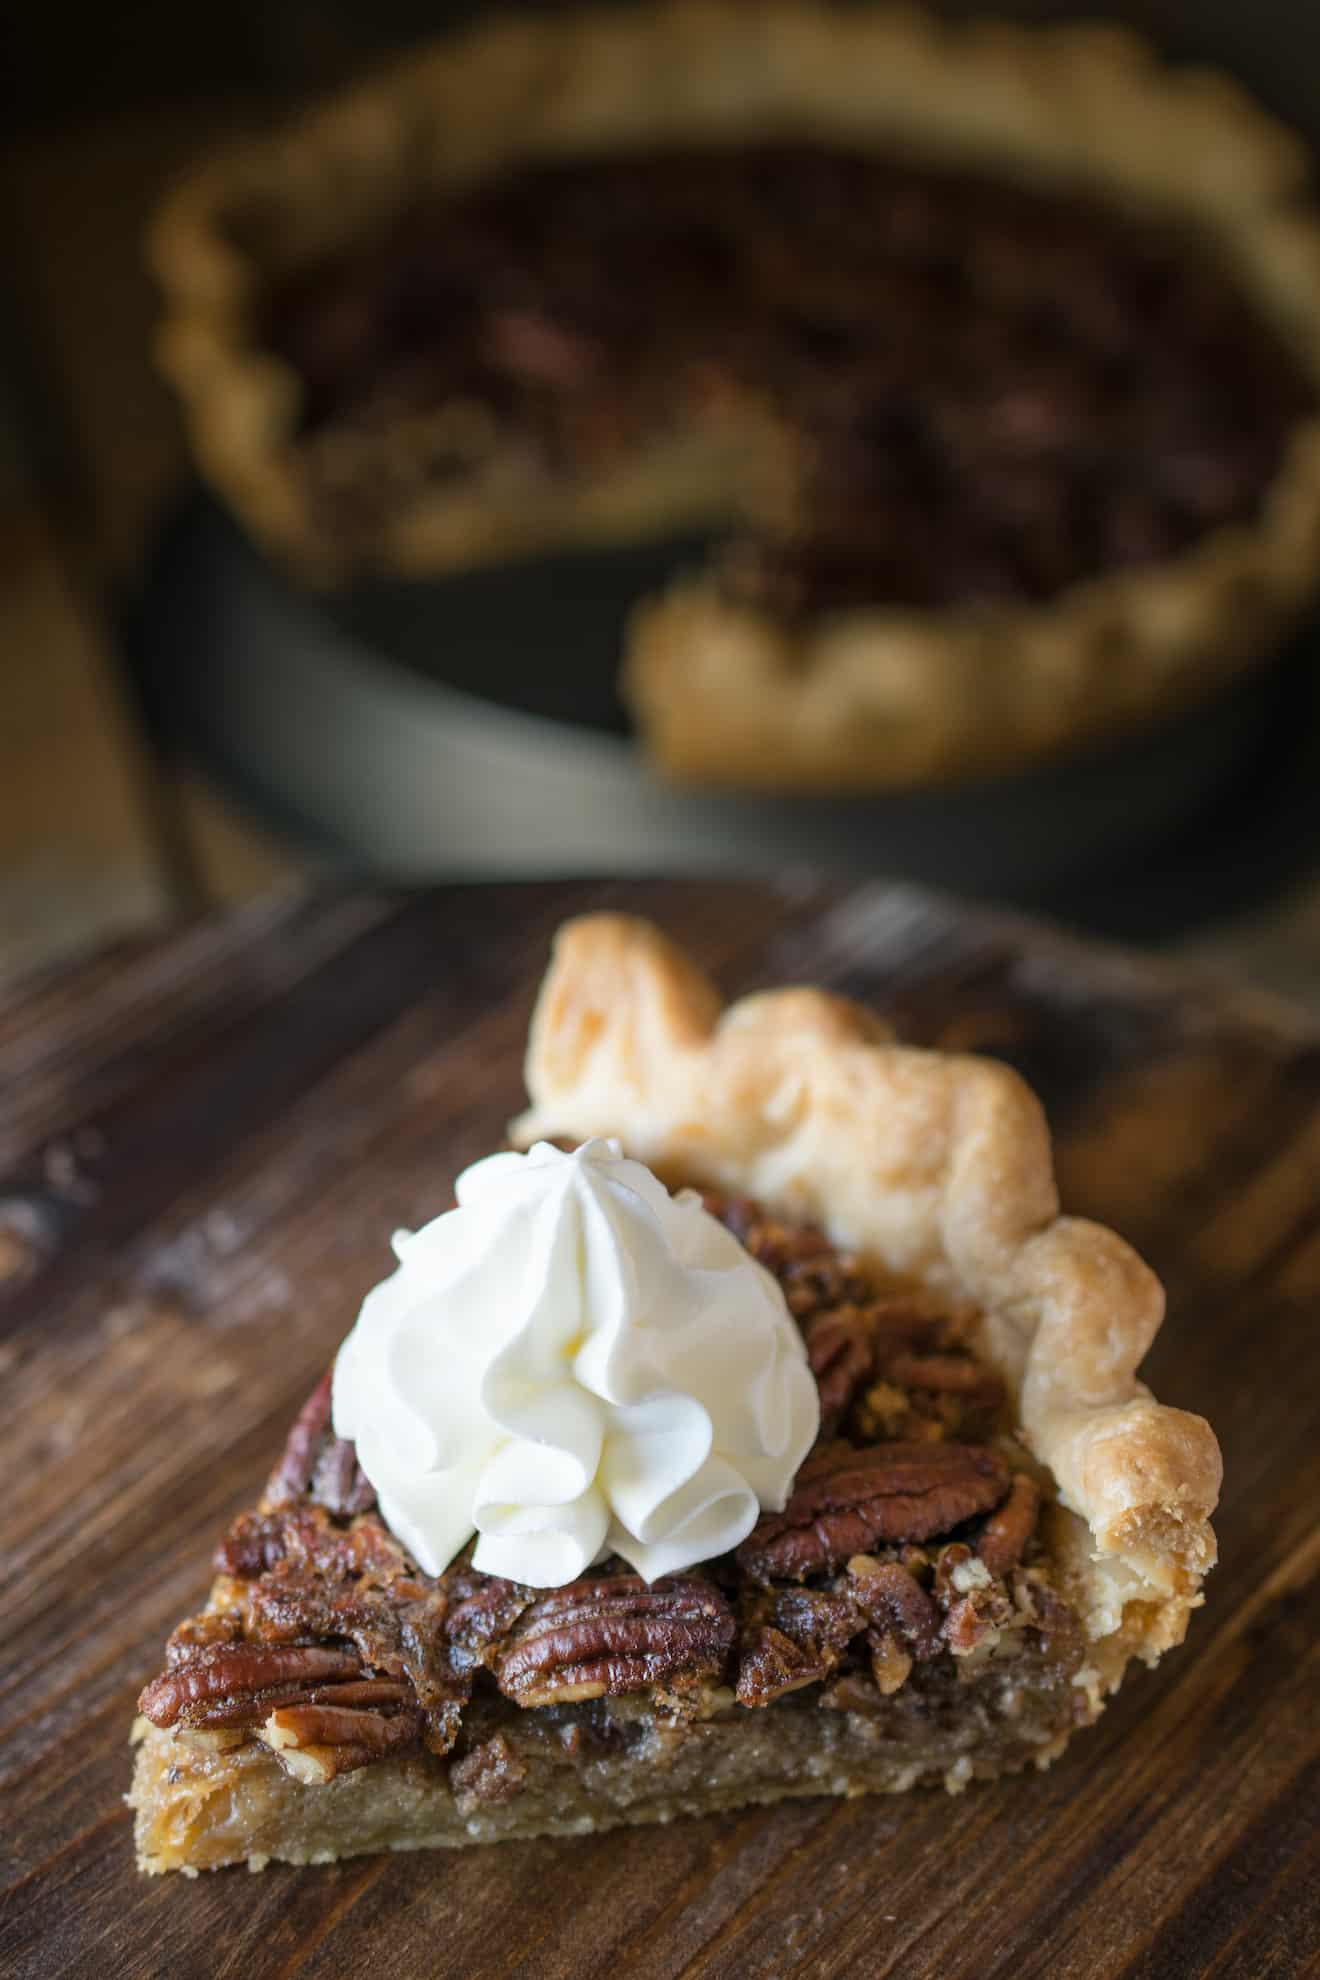 A slice of Bourbon Pecan Pie on a serving board